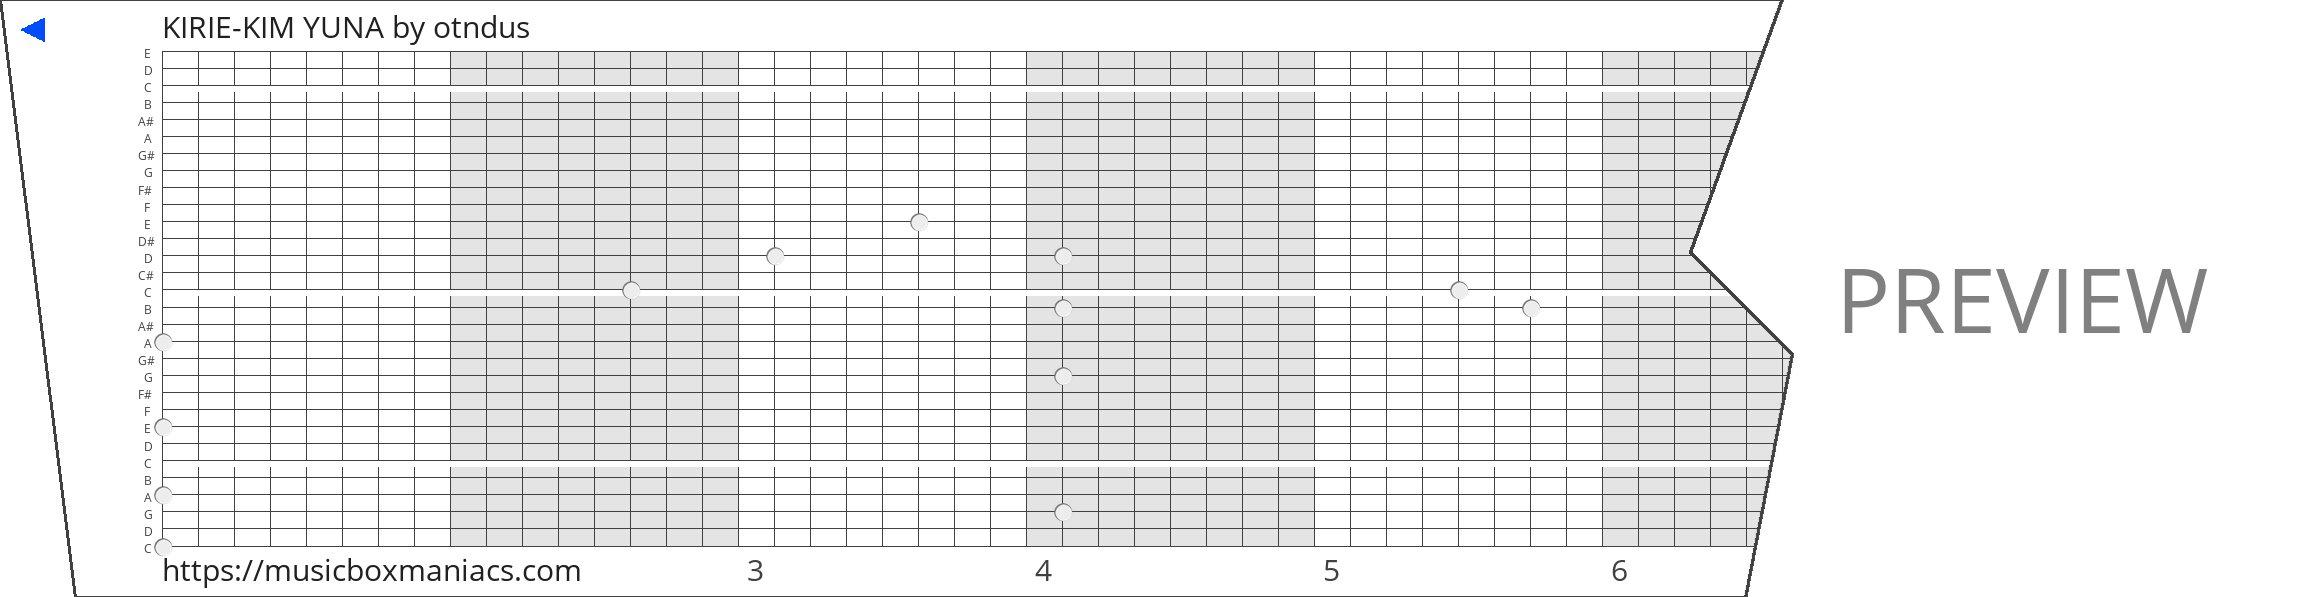 KIRIE-KIM YUNA 30 note music box paper strip